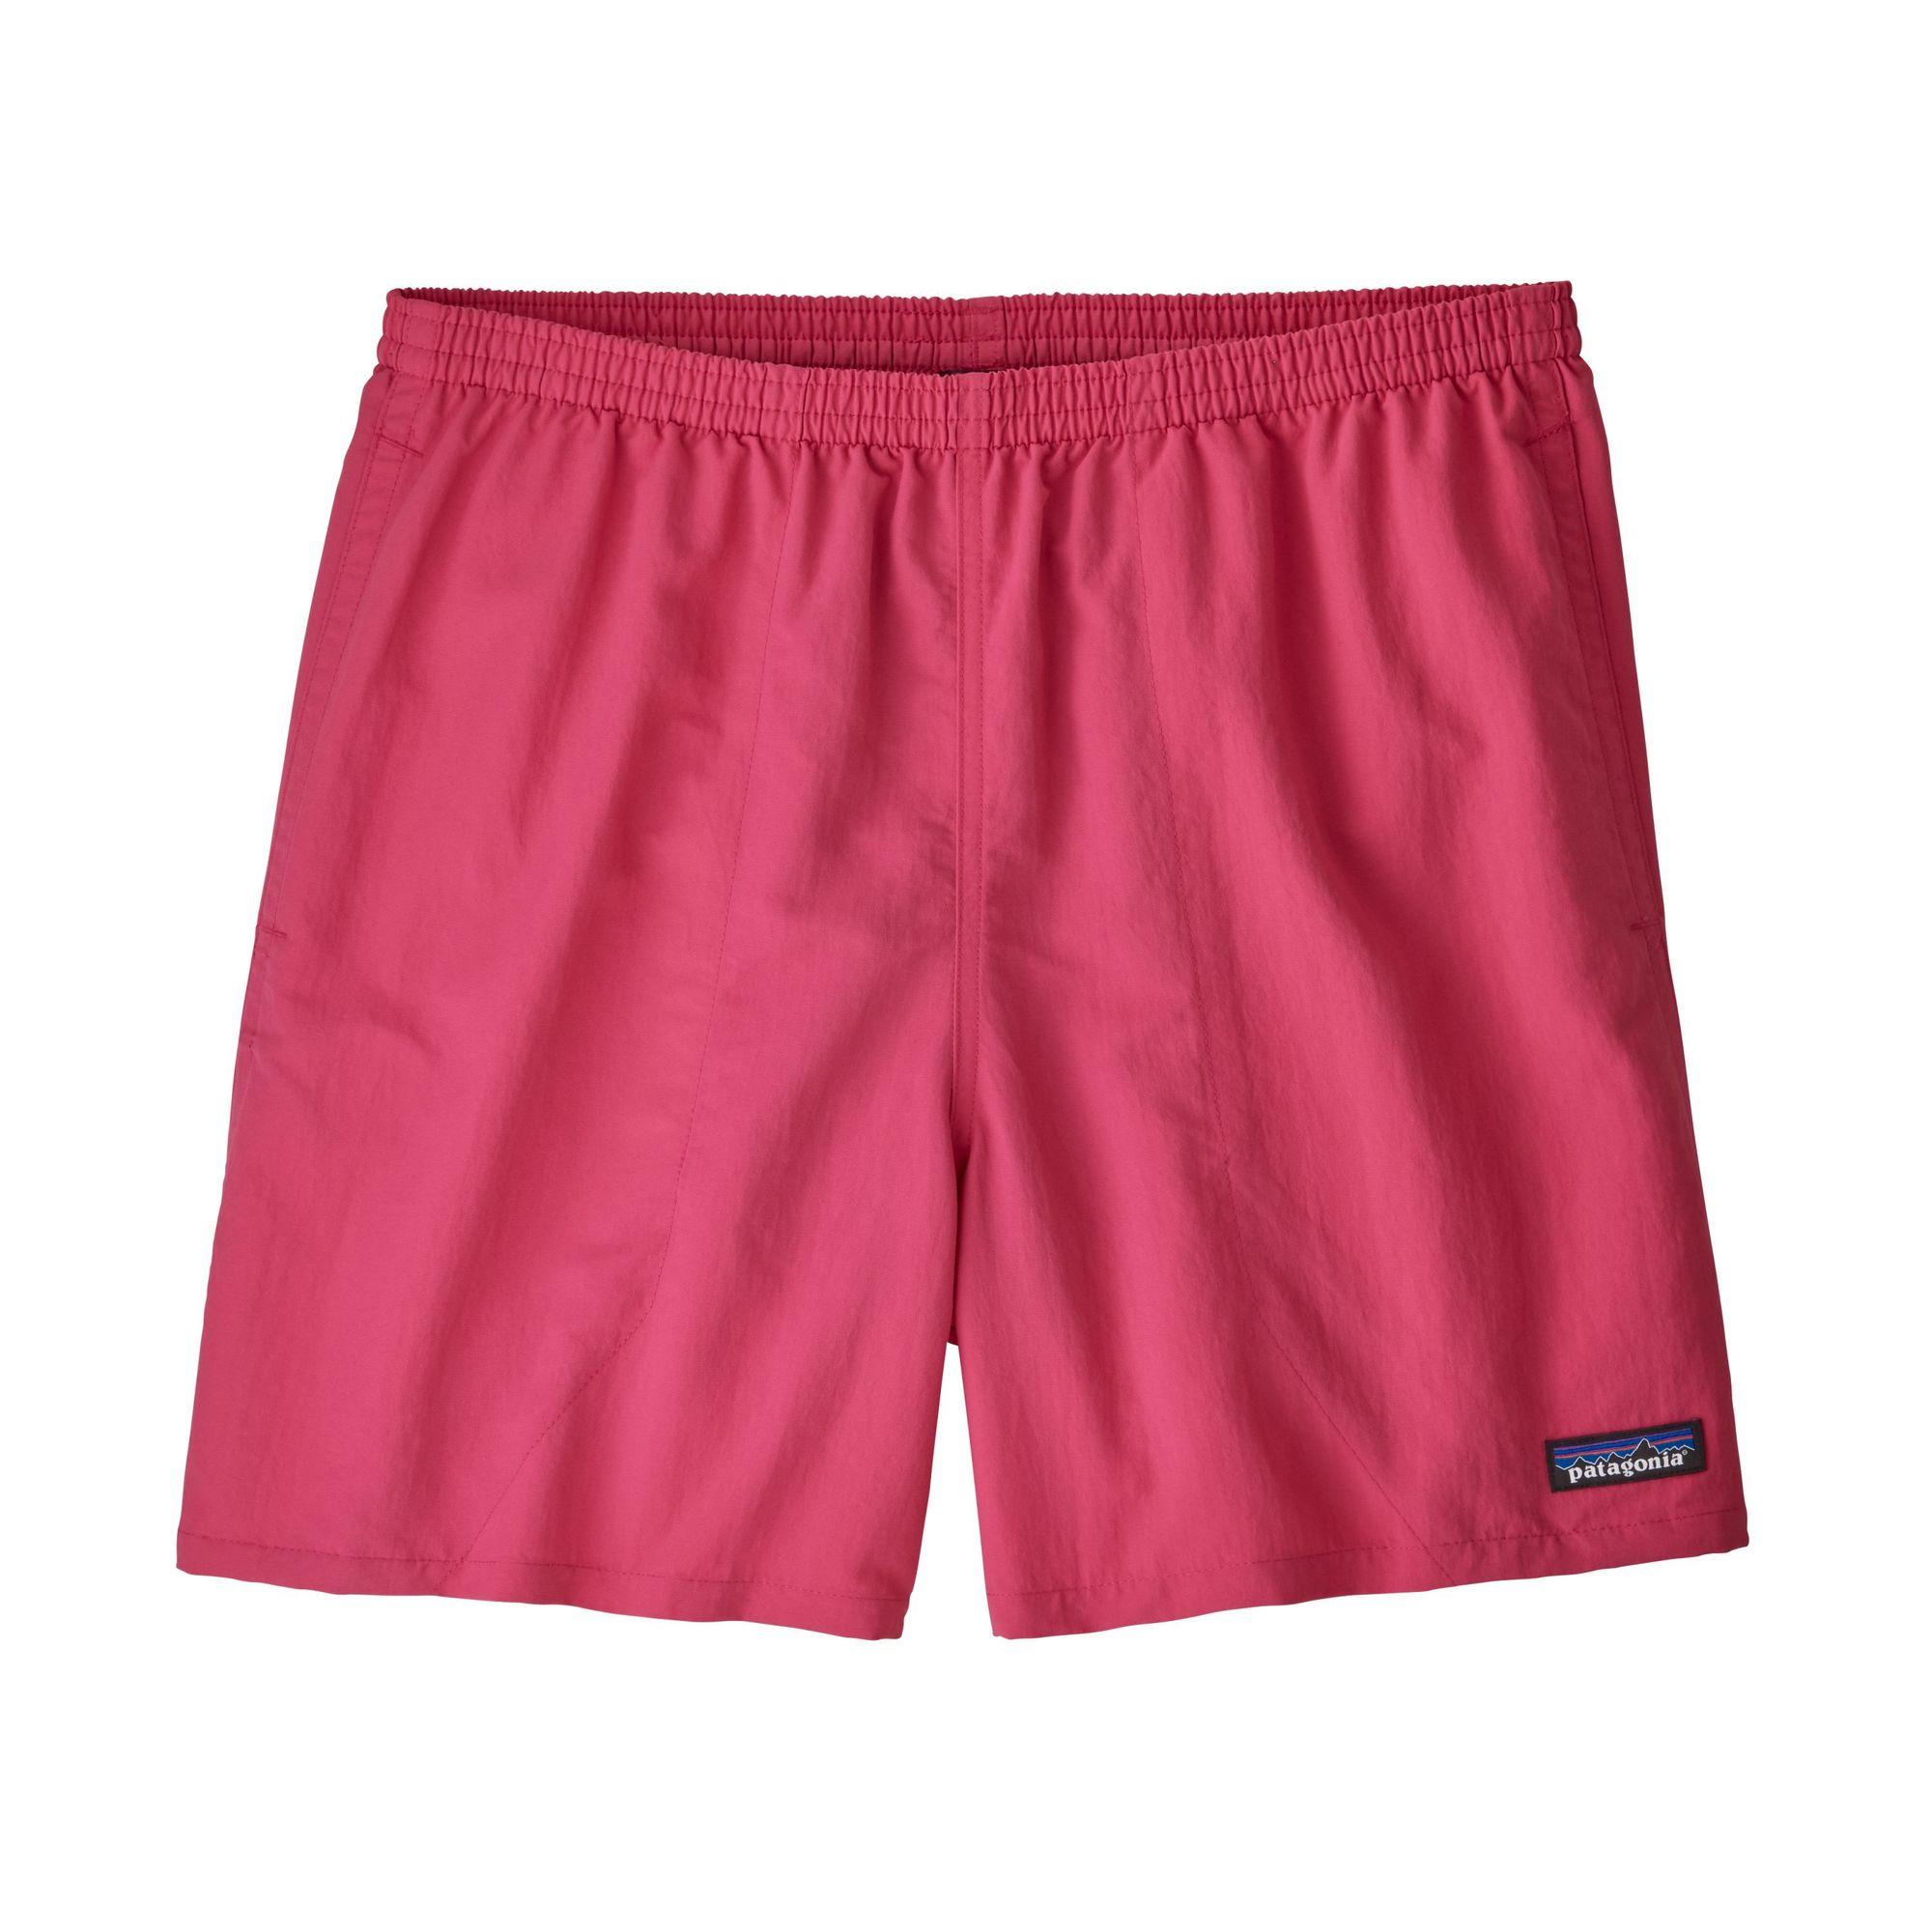 Men's Baggies Shorts - 5 In.